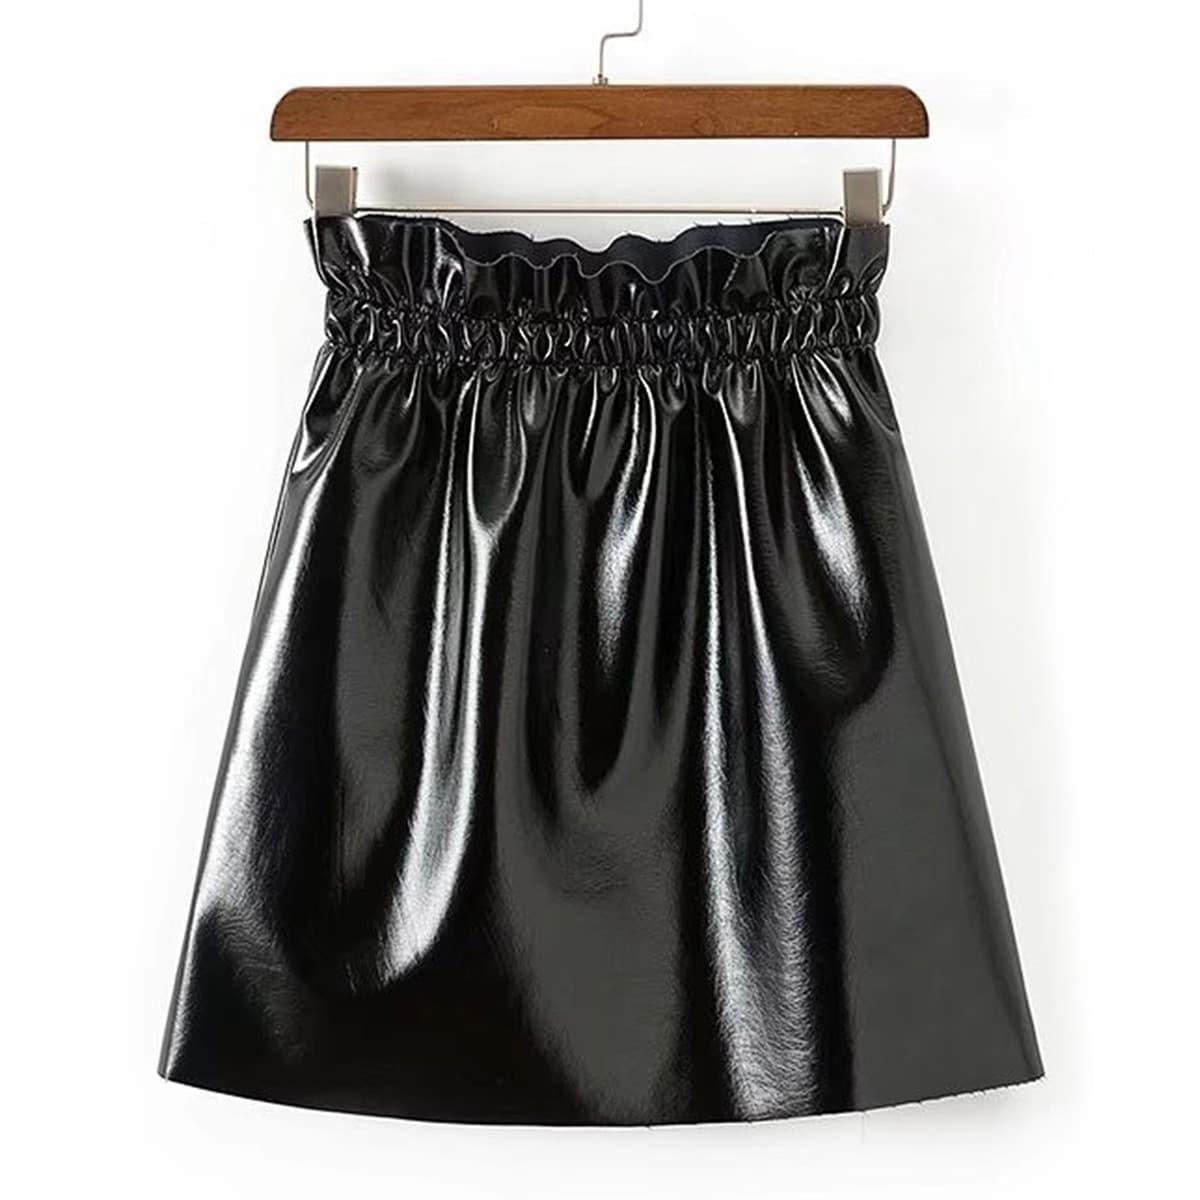 - Elastic Waist PU Skirt